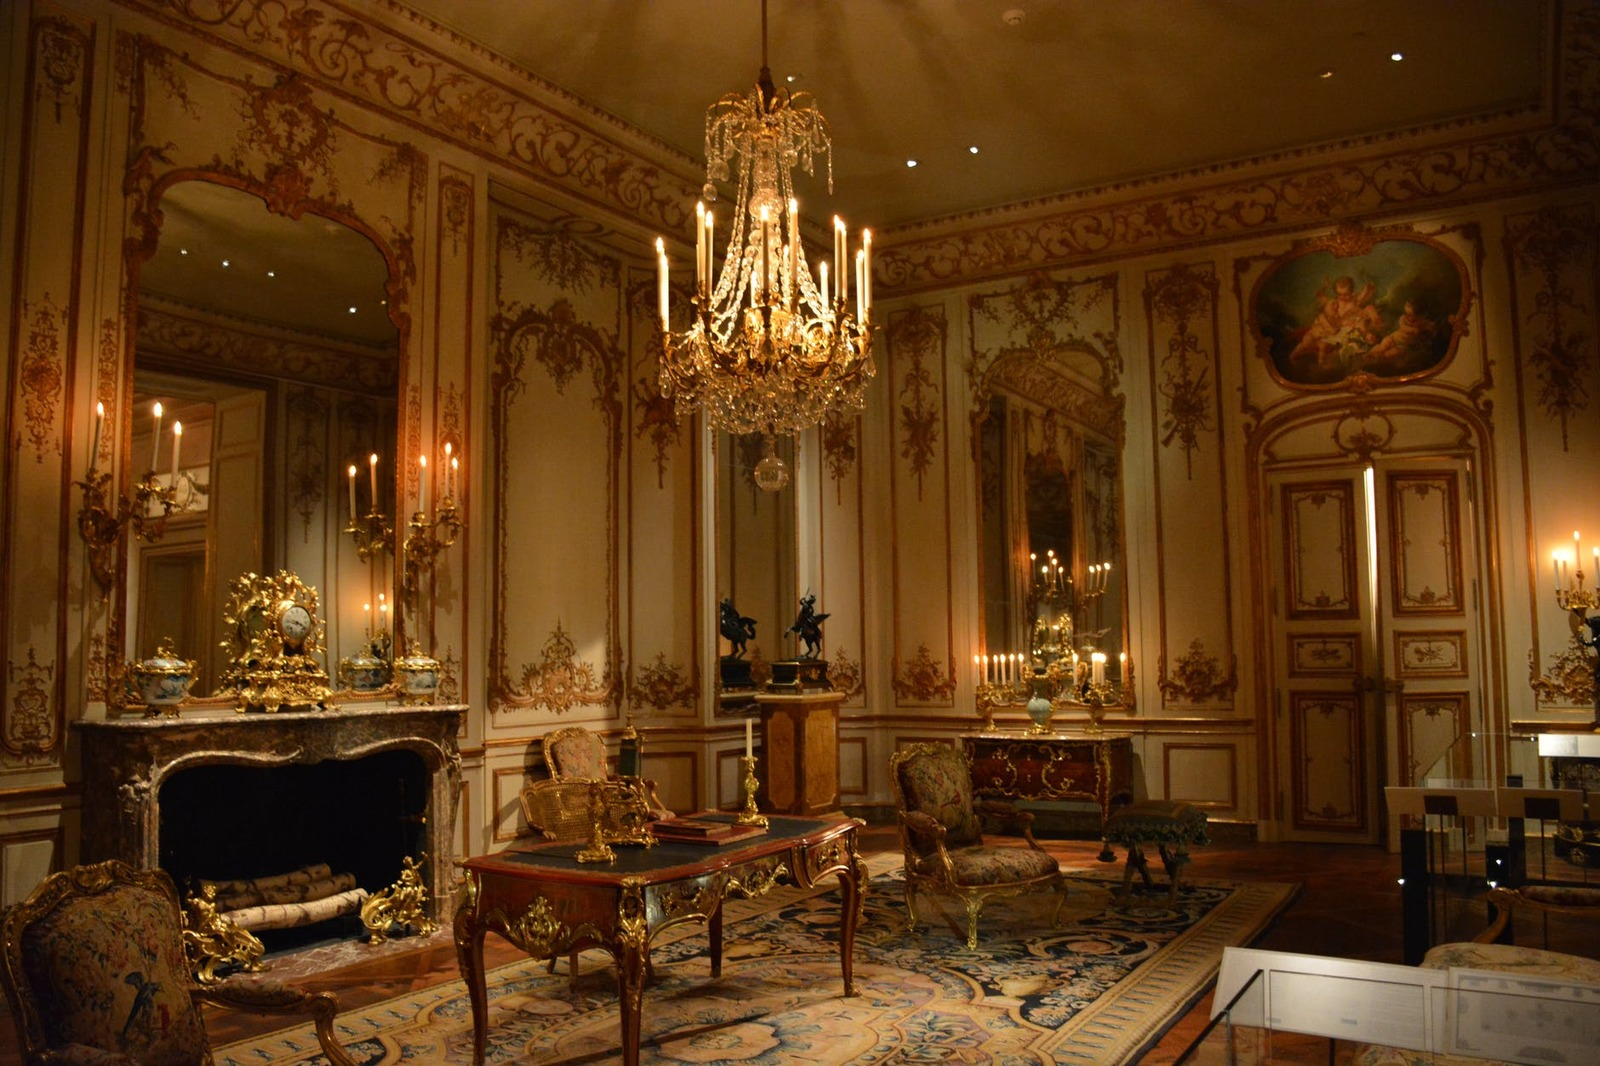 Doge's Palace – A palace turned museum